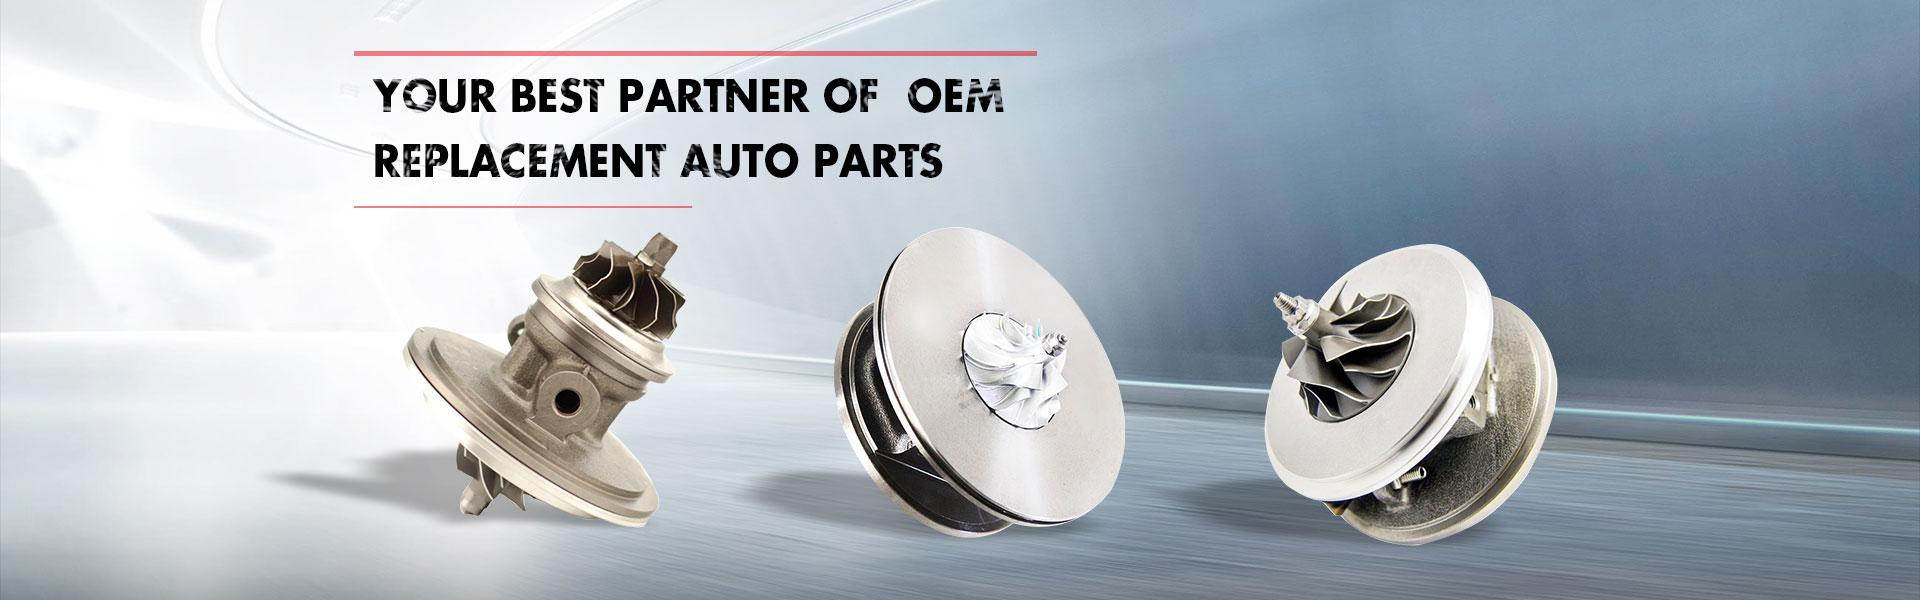 Turbocharger Spare Parts